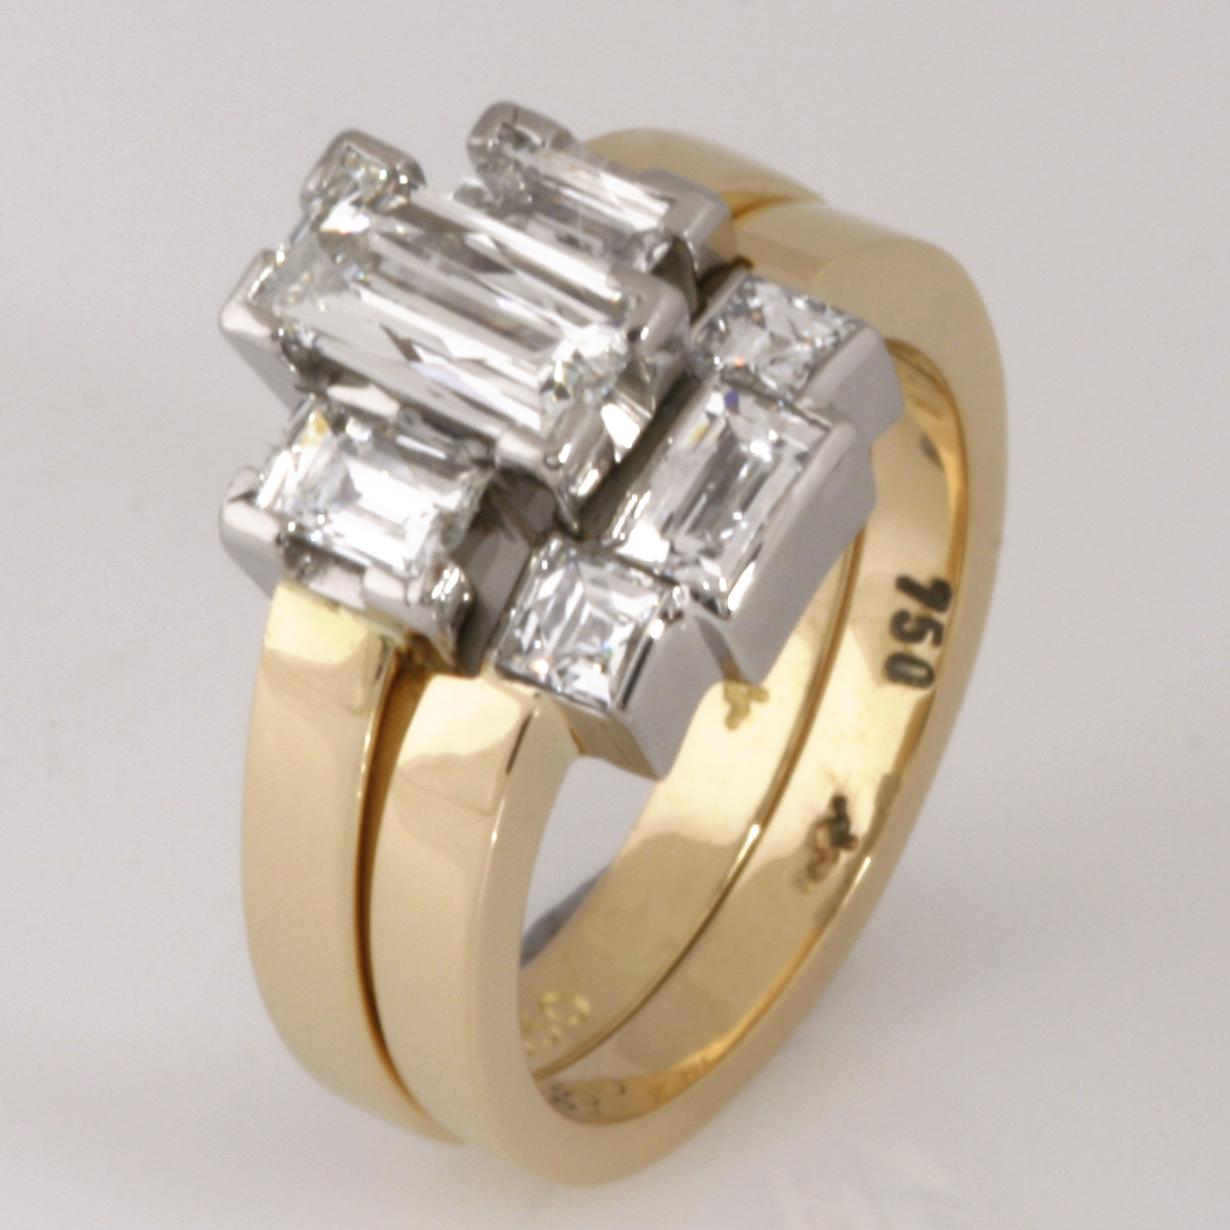 Handmade ladies 18ct yellow gold and palladium 'Tycoon' cut diamond wedding set